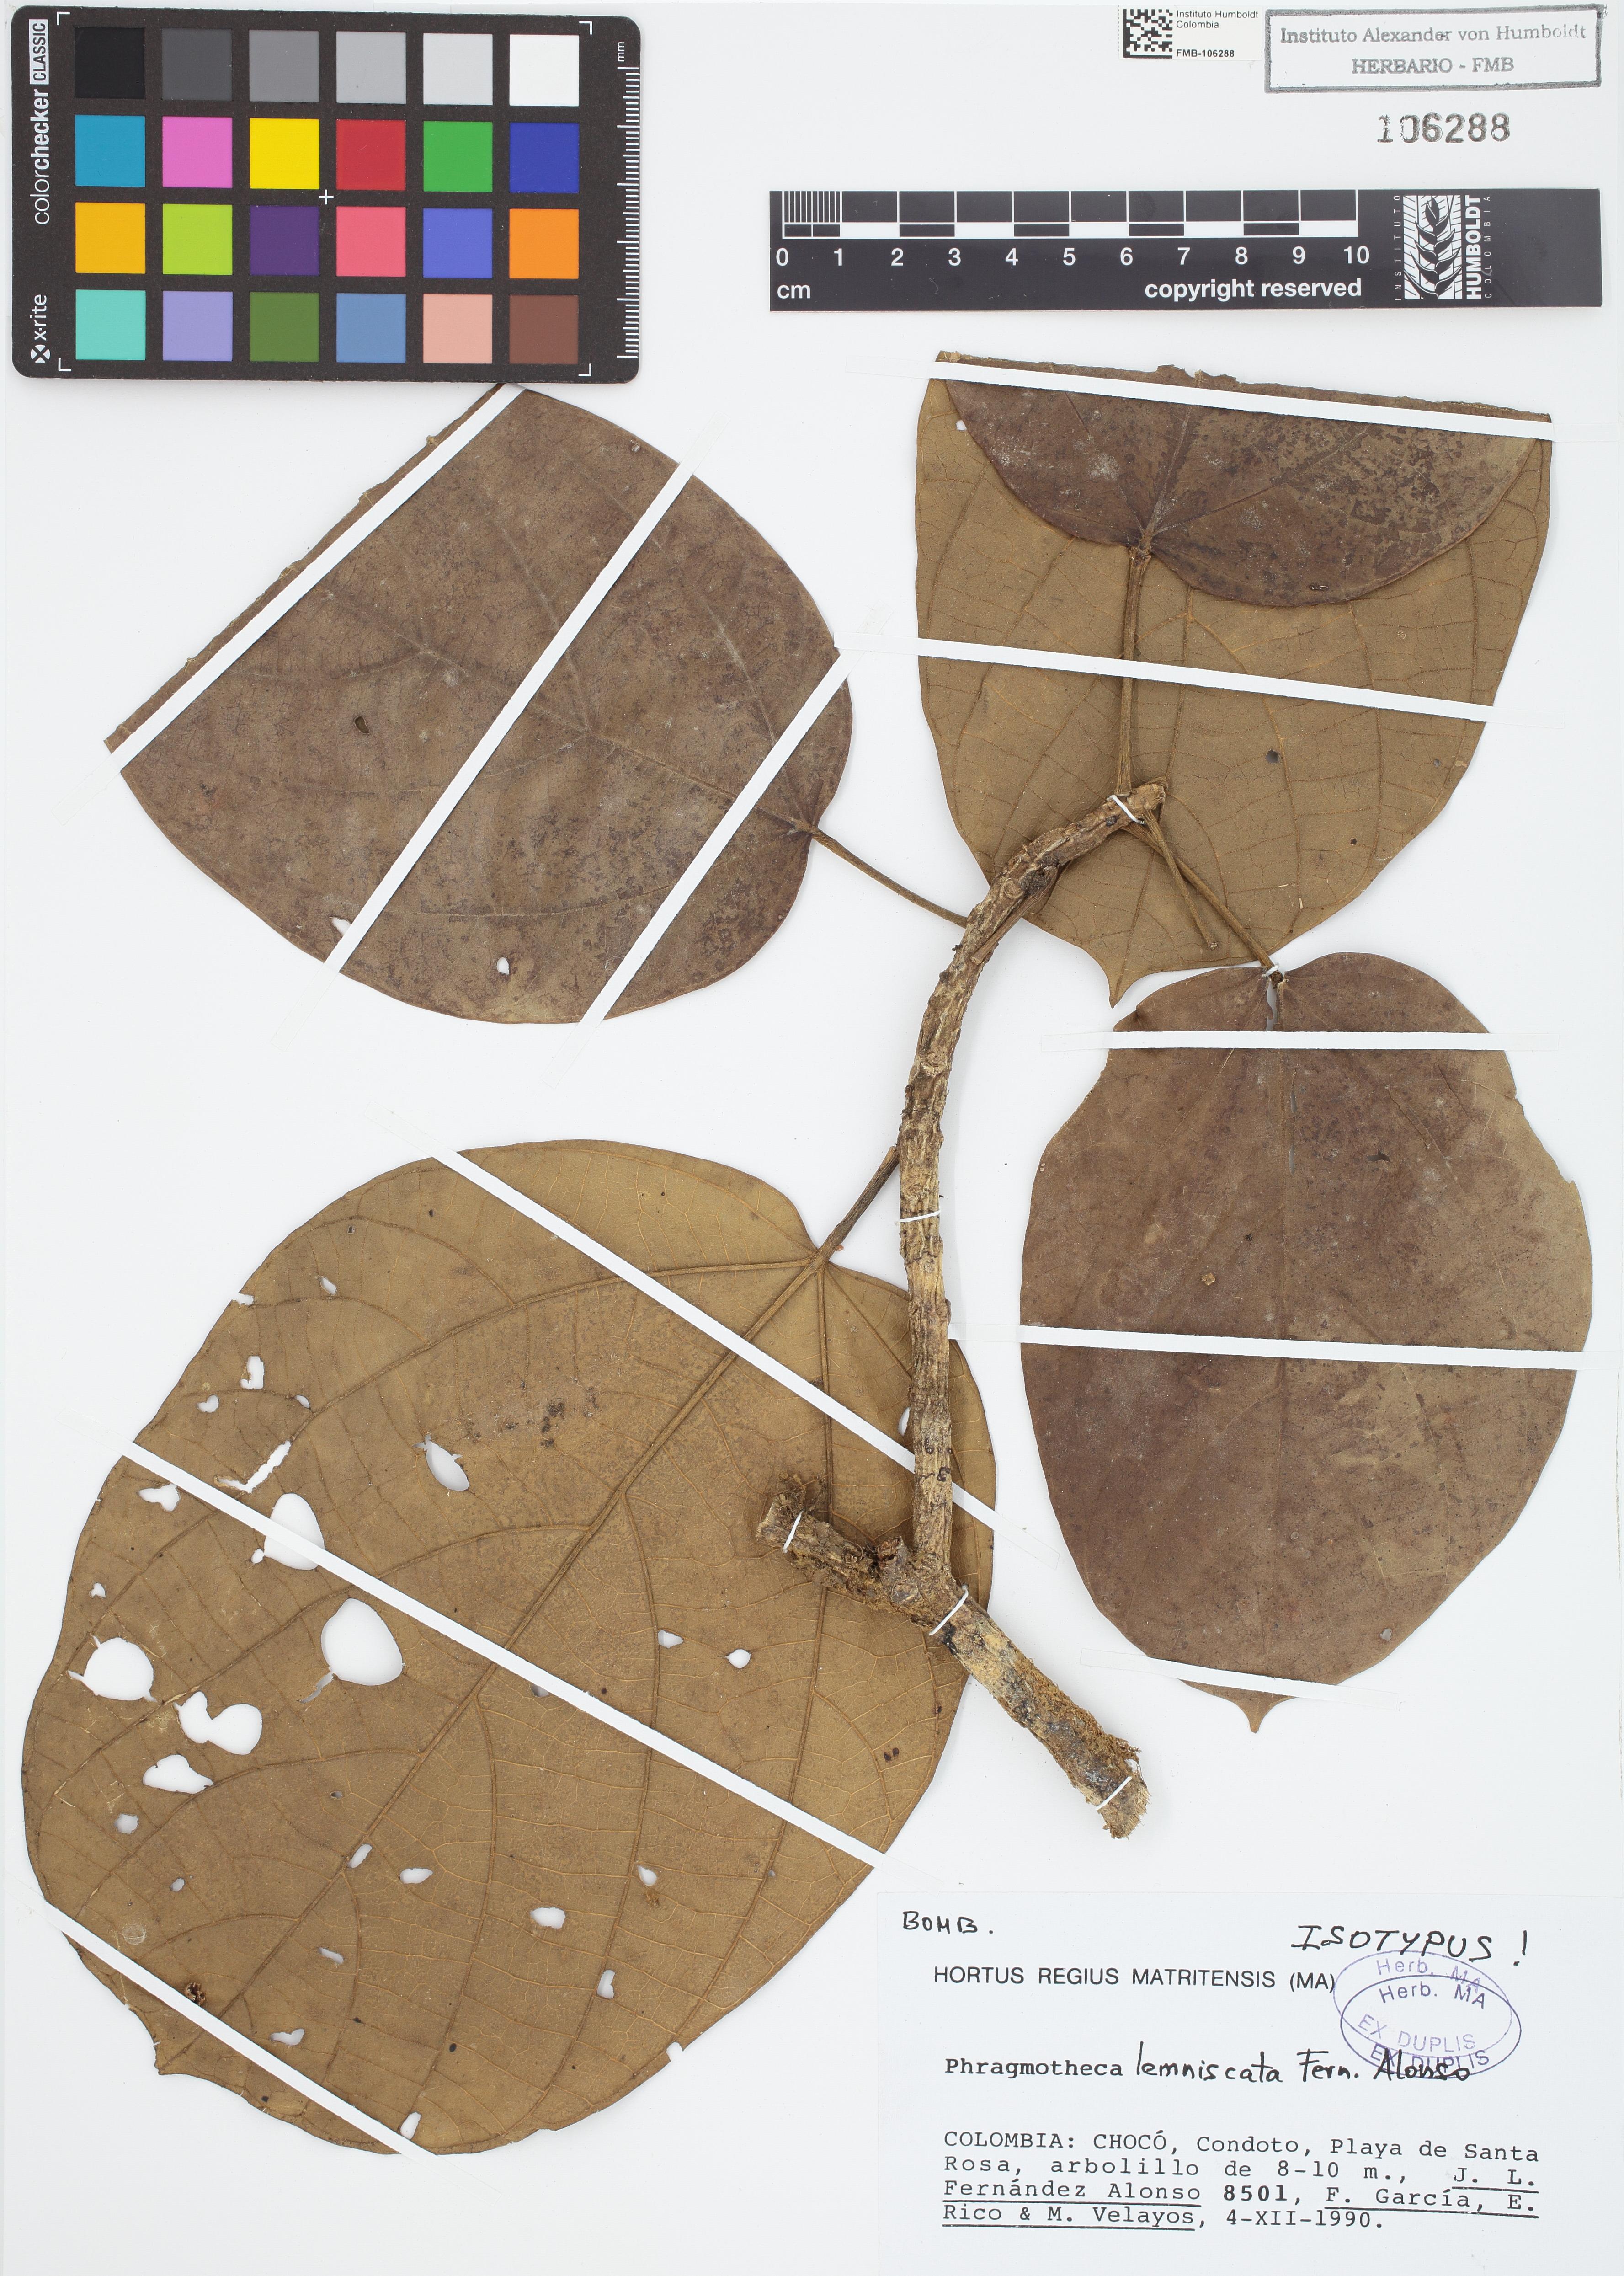 Isotipo de <em>Phragmotheca lemniscata</em>, FMB-106288, Fotografía por Robles A.